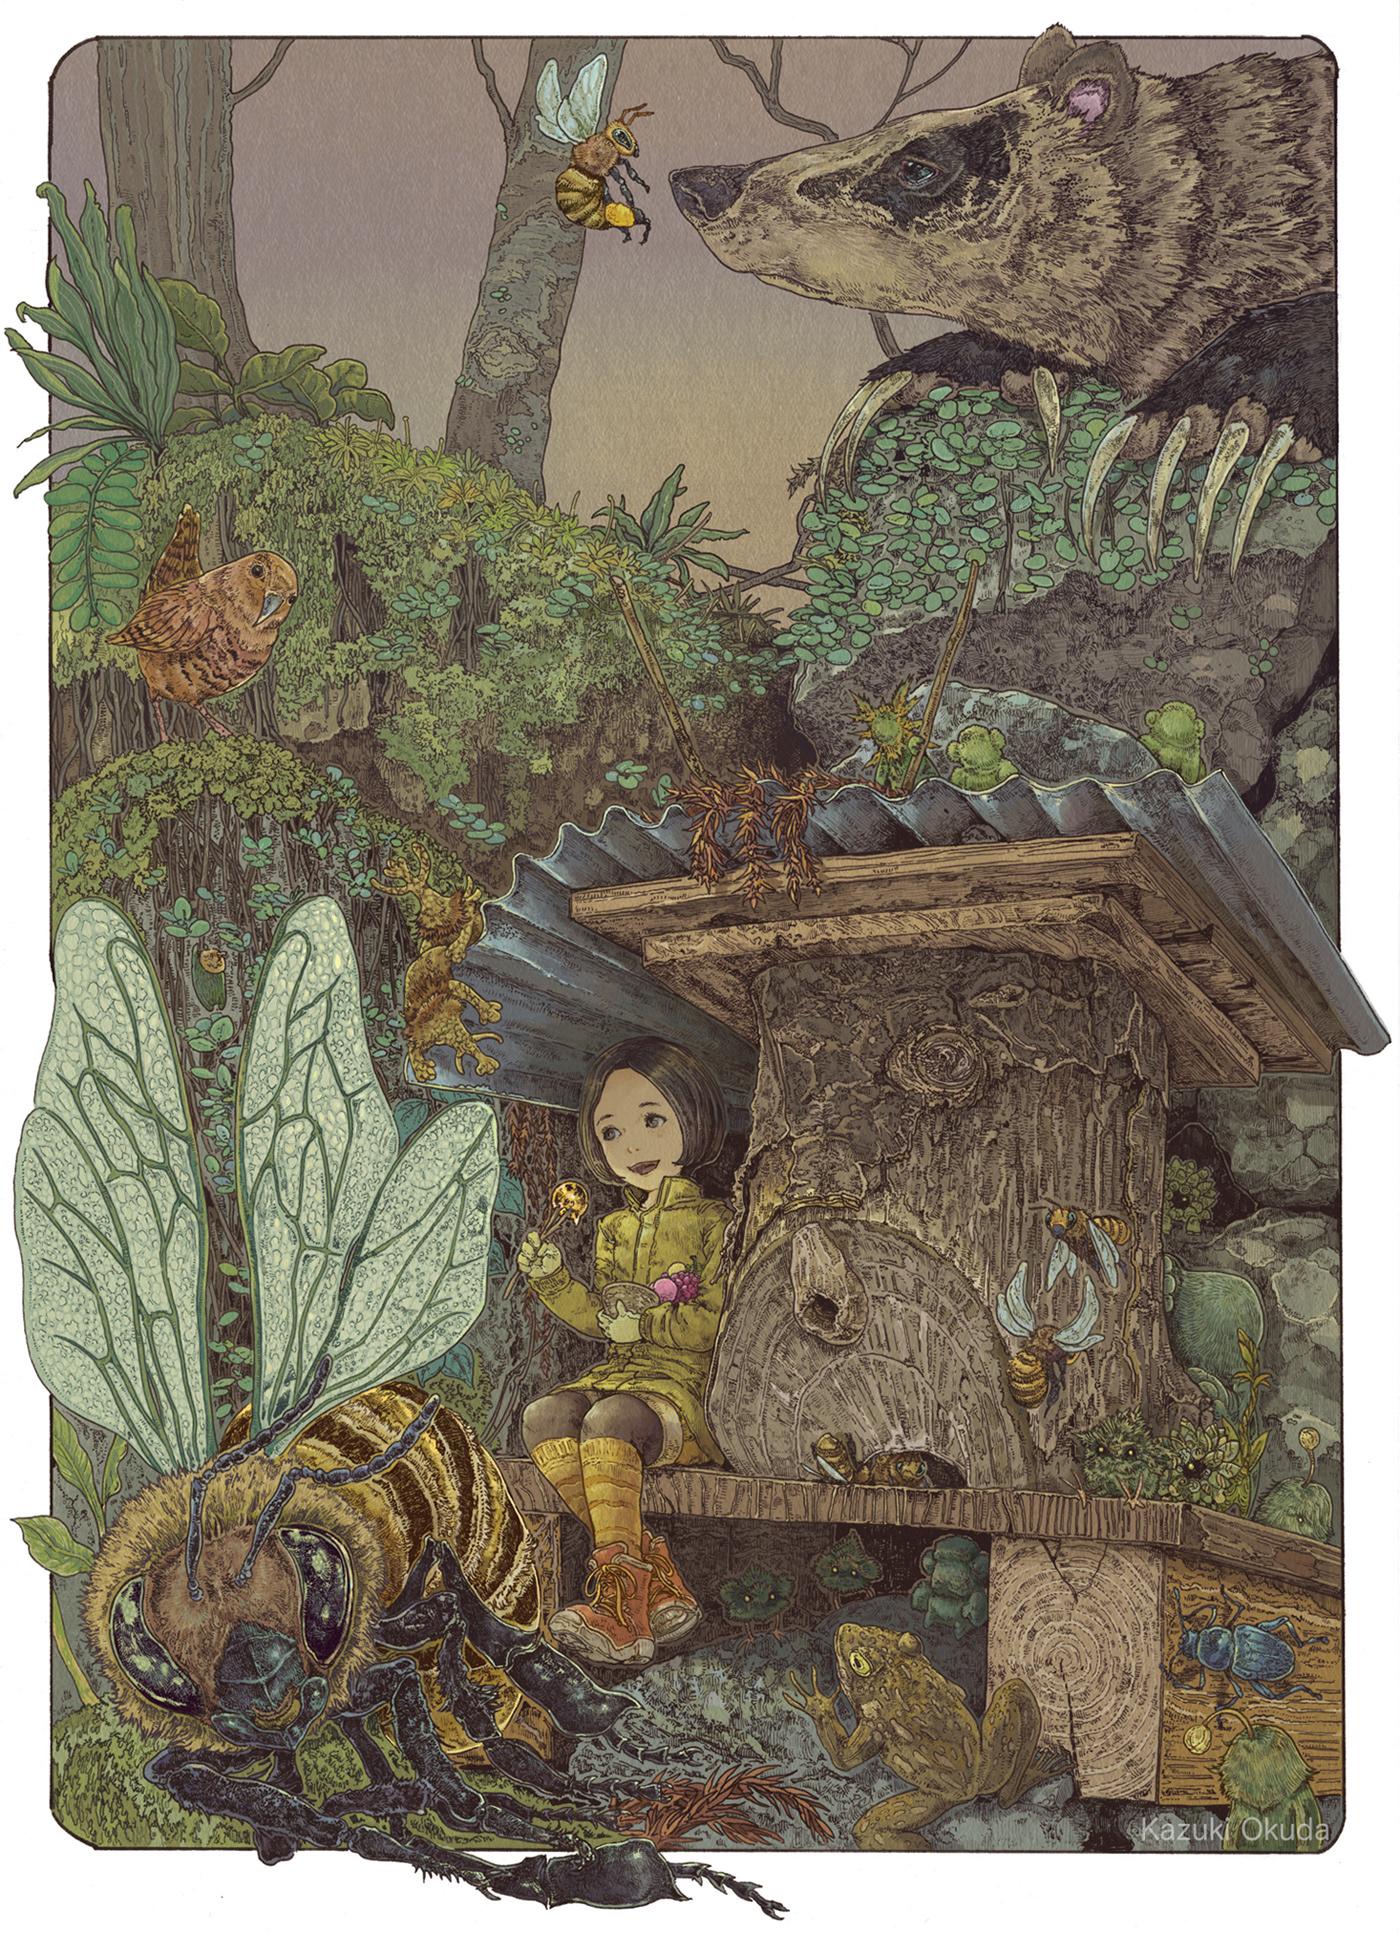 animal fairytale fantasy girl ILLUSTRATION  insect japan Landscape Nature photoshop